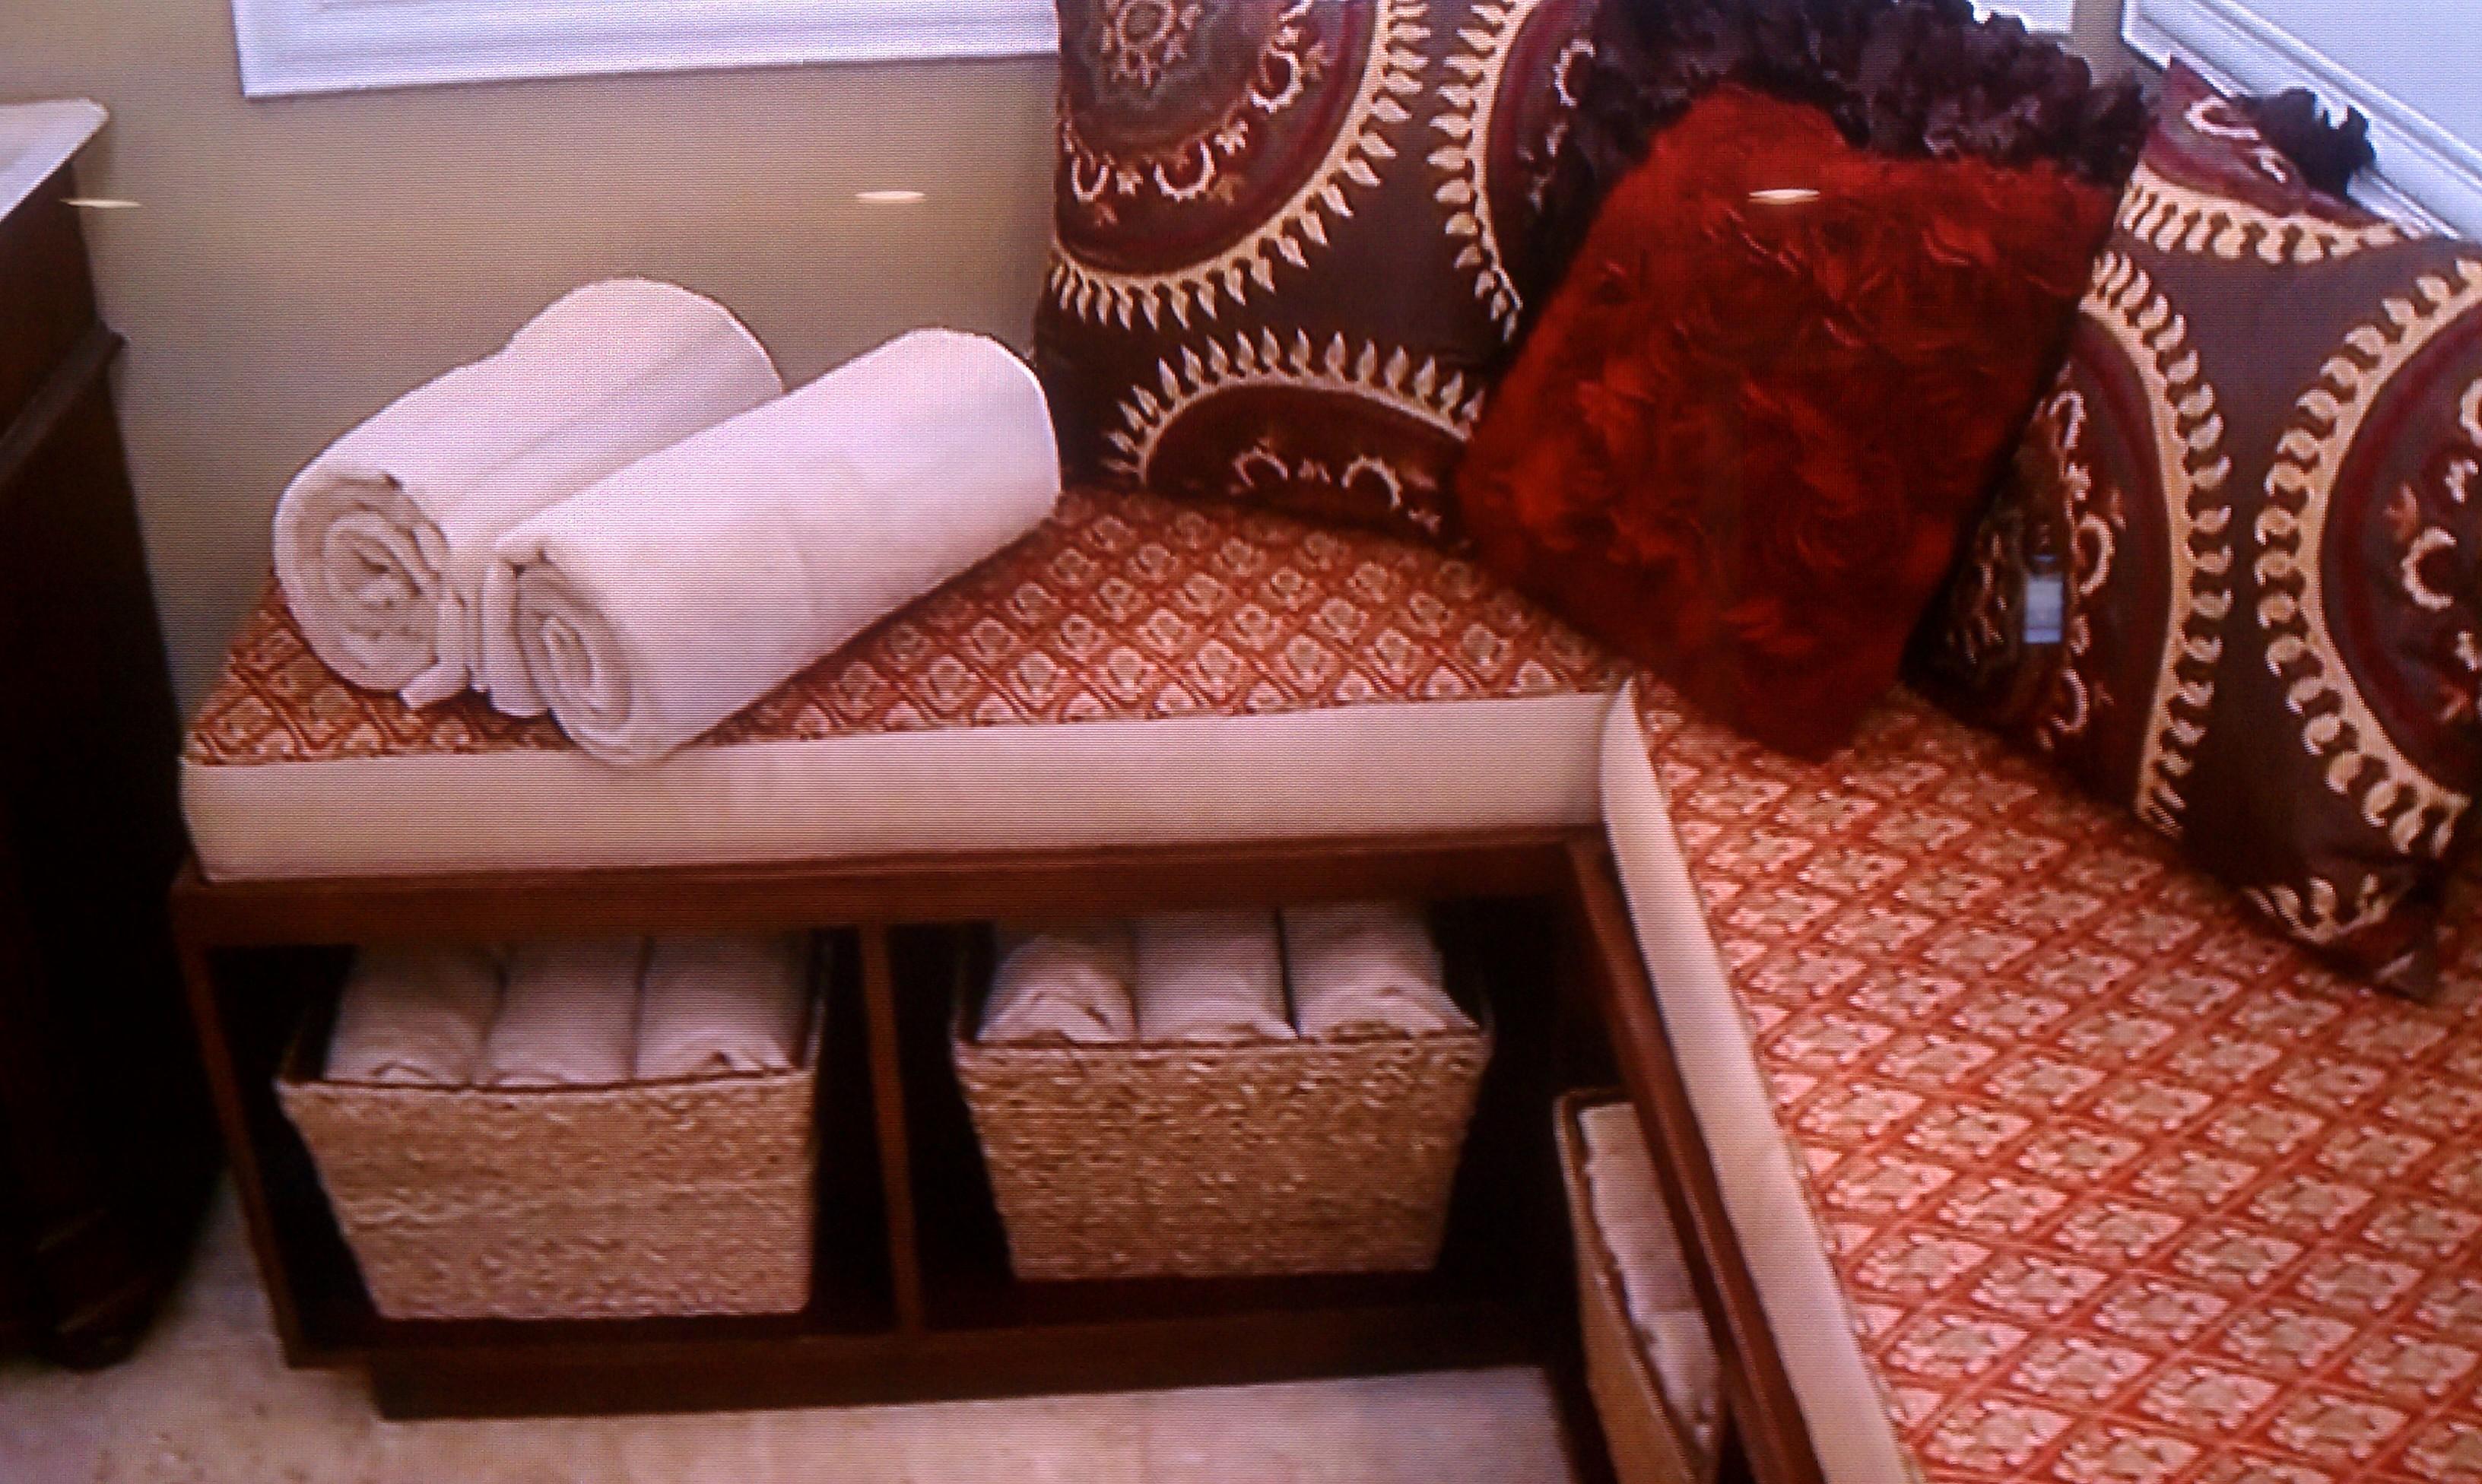 Bench Seat With Storage Underneath